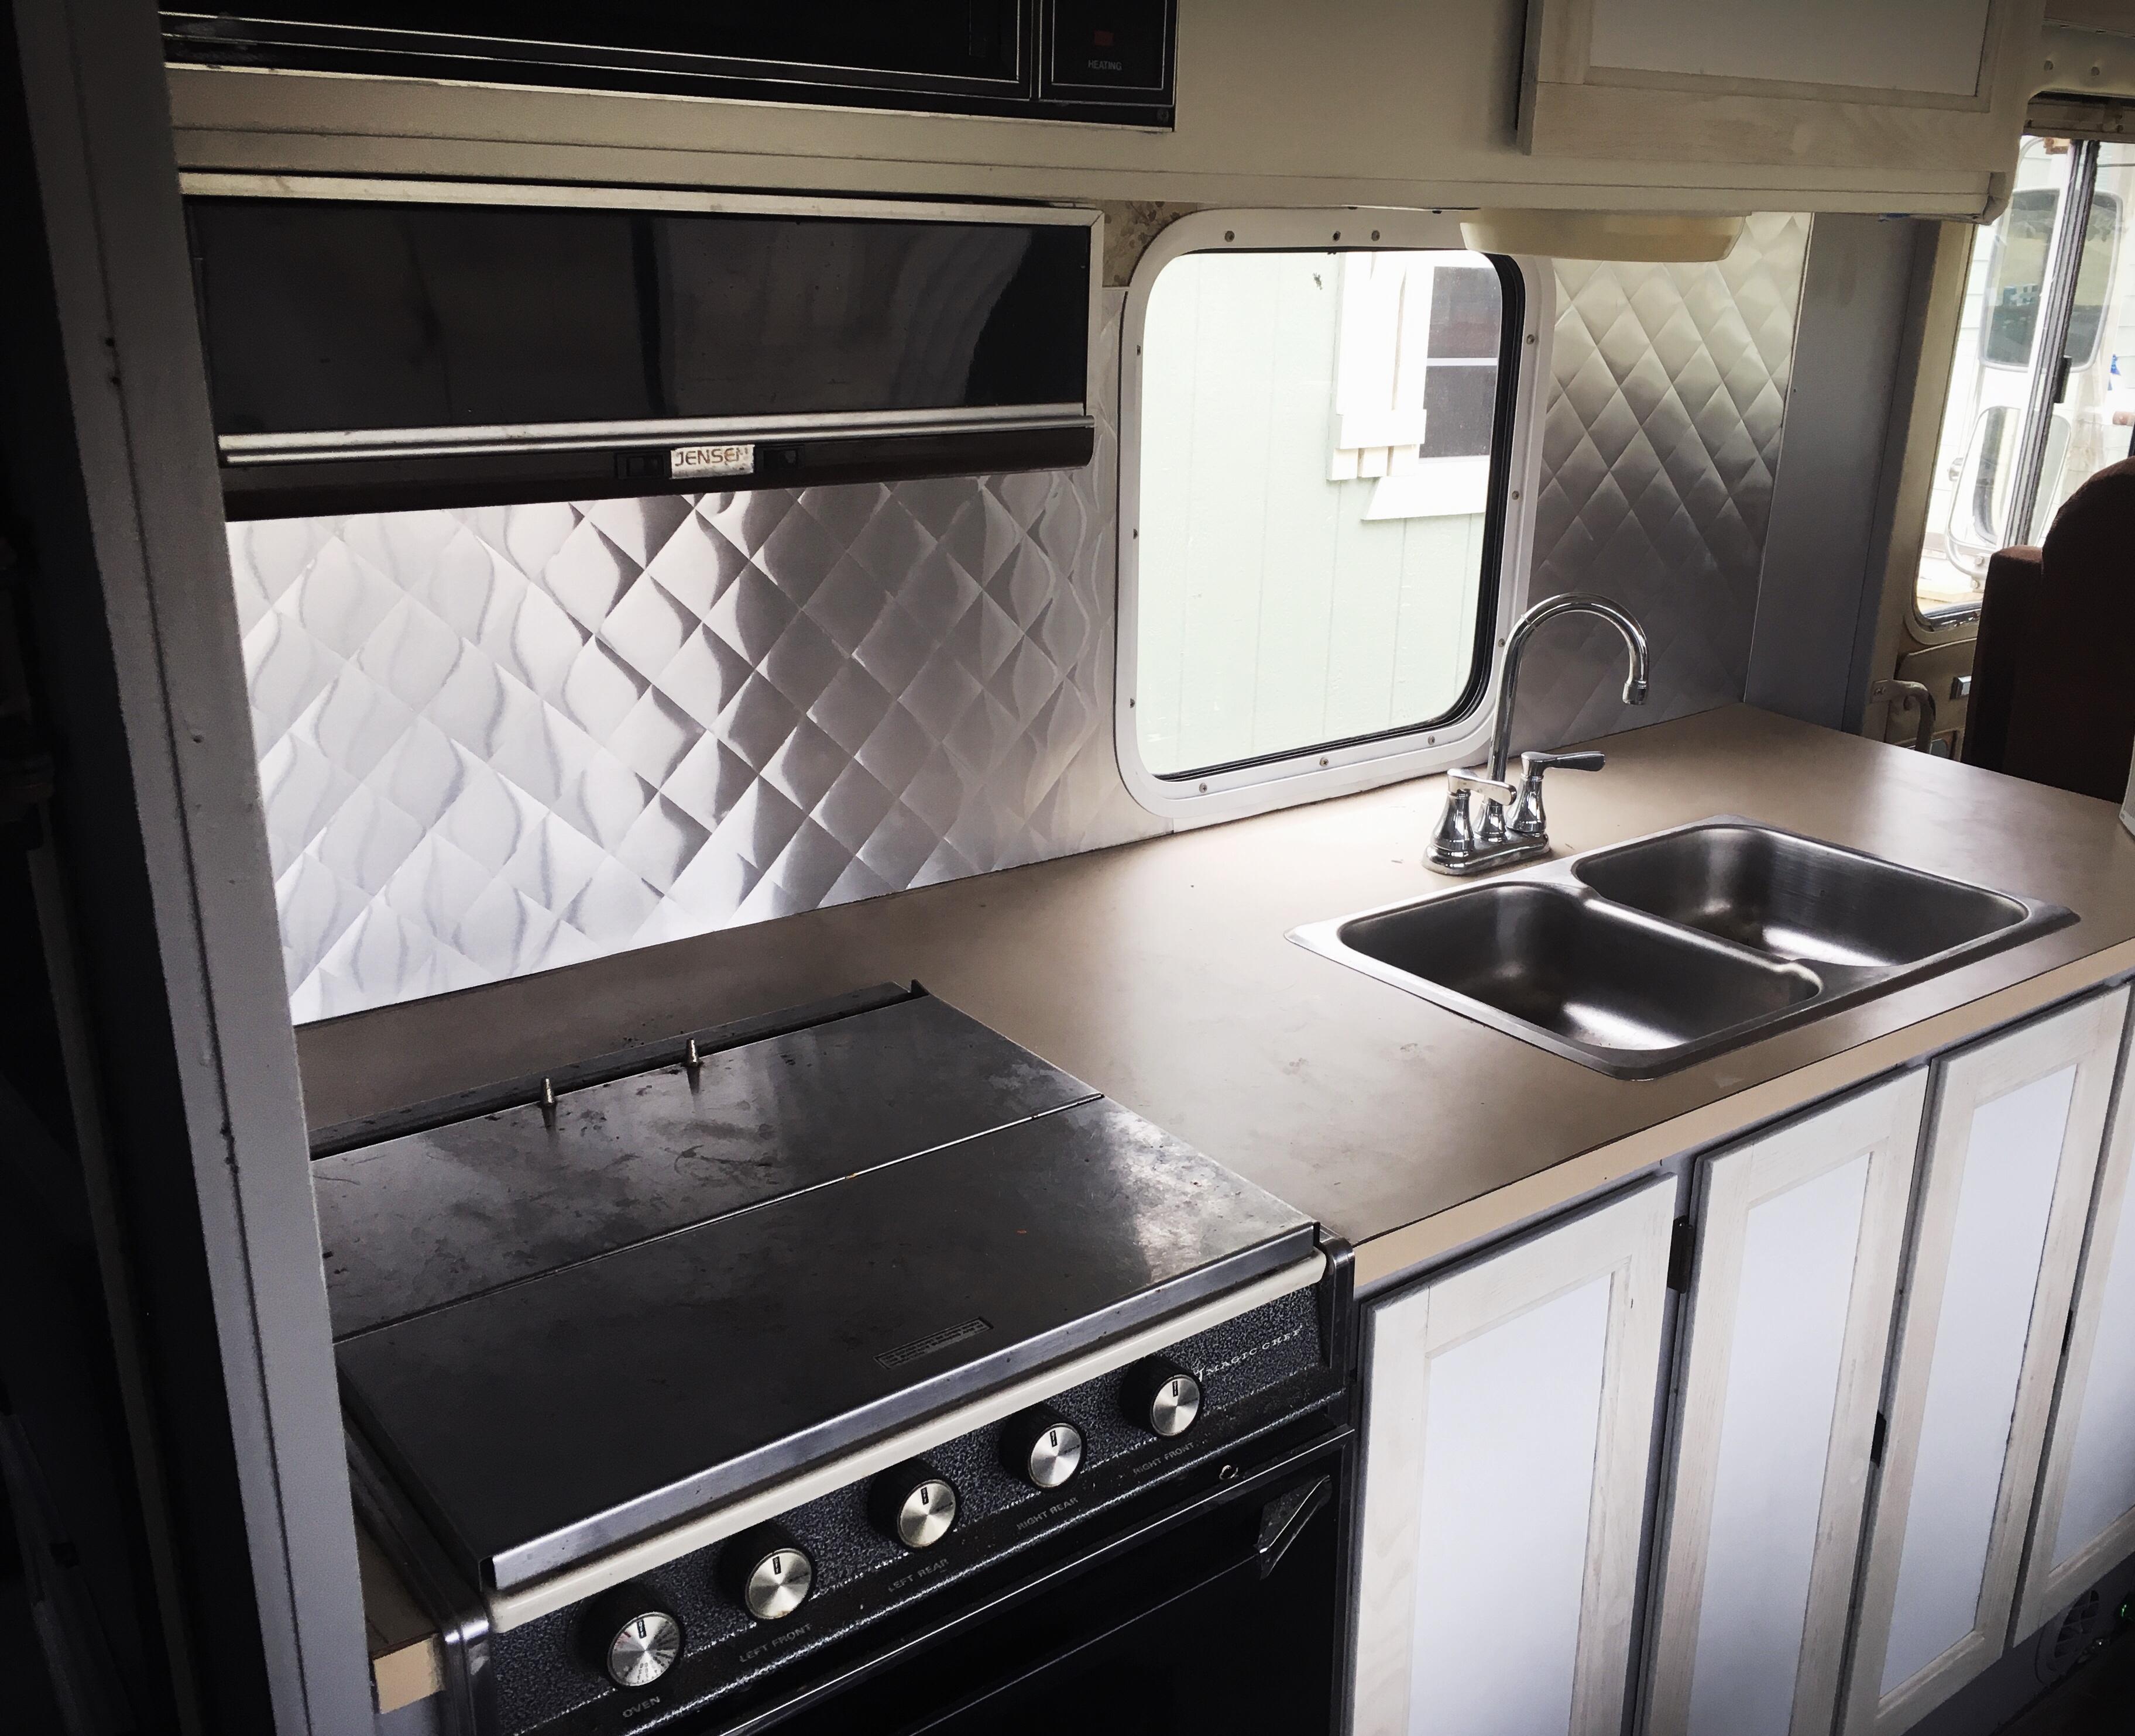 Picture of Quilted Aluminum Backsplash